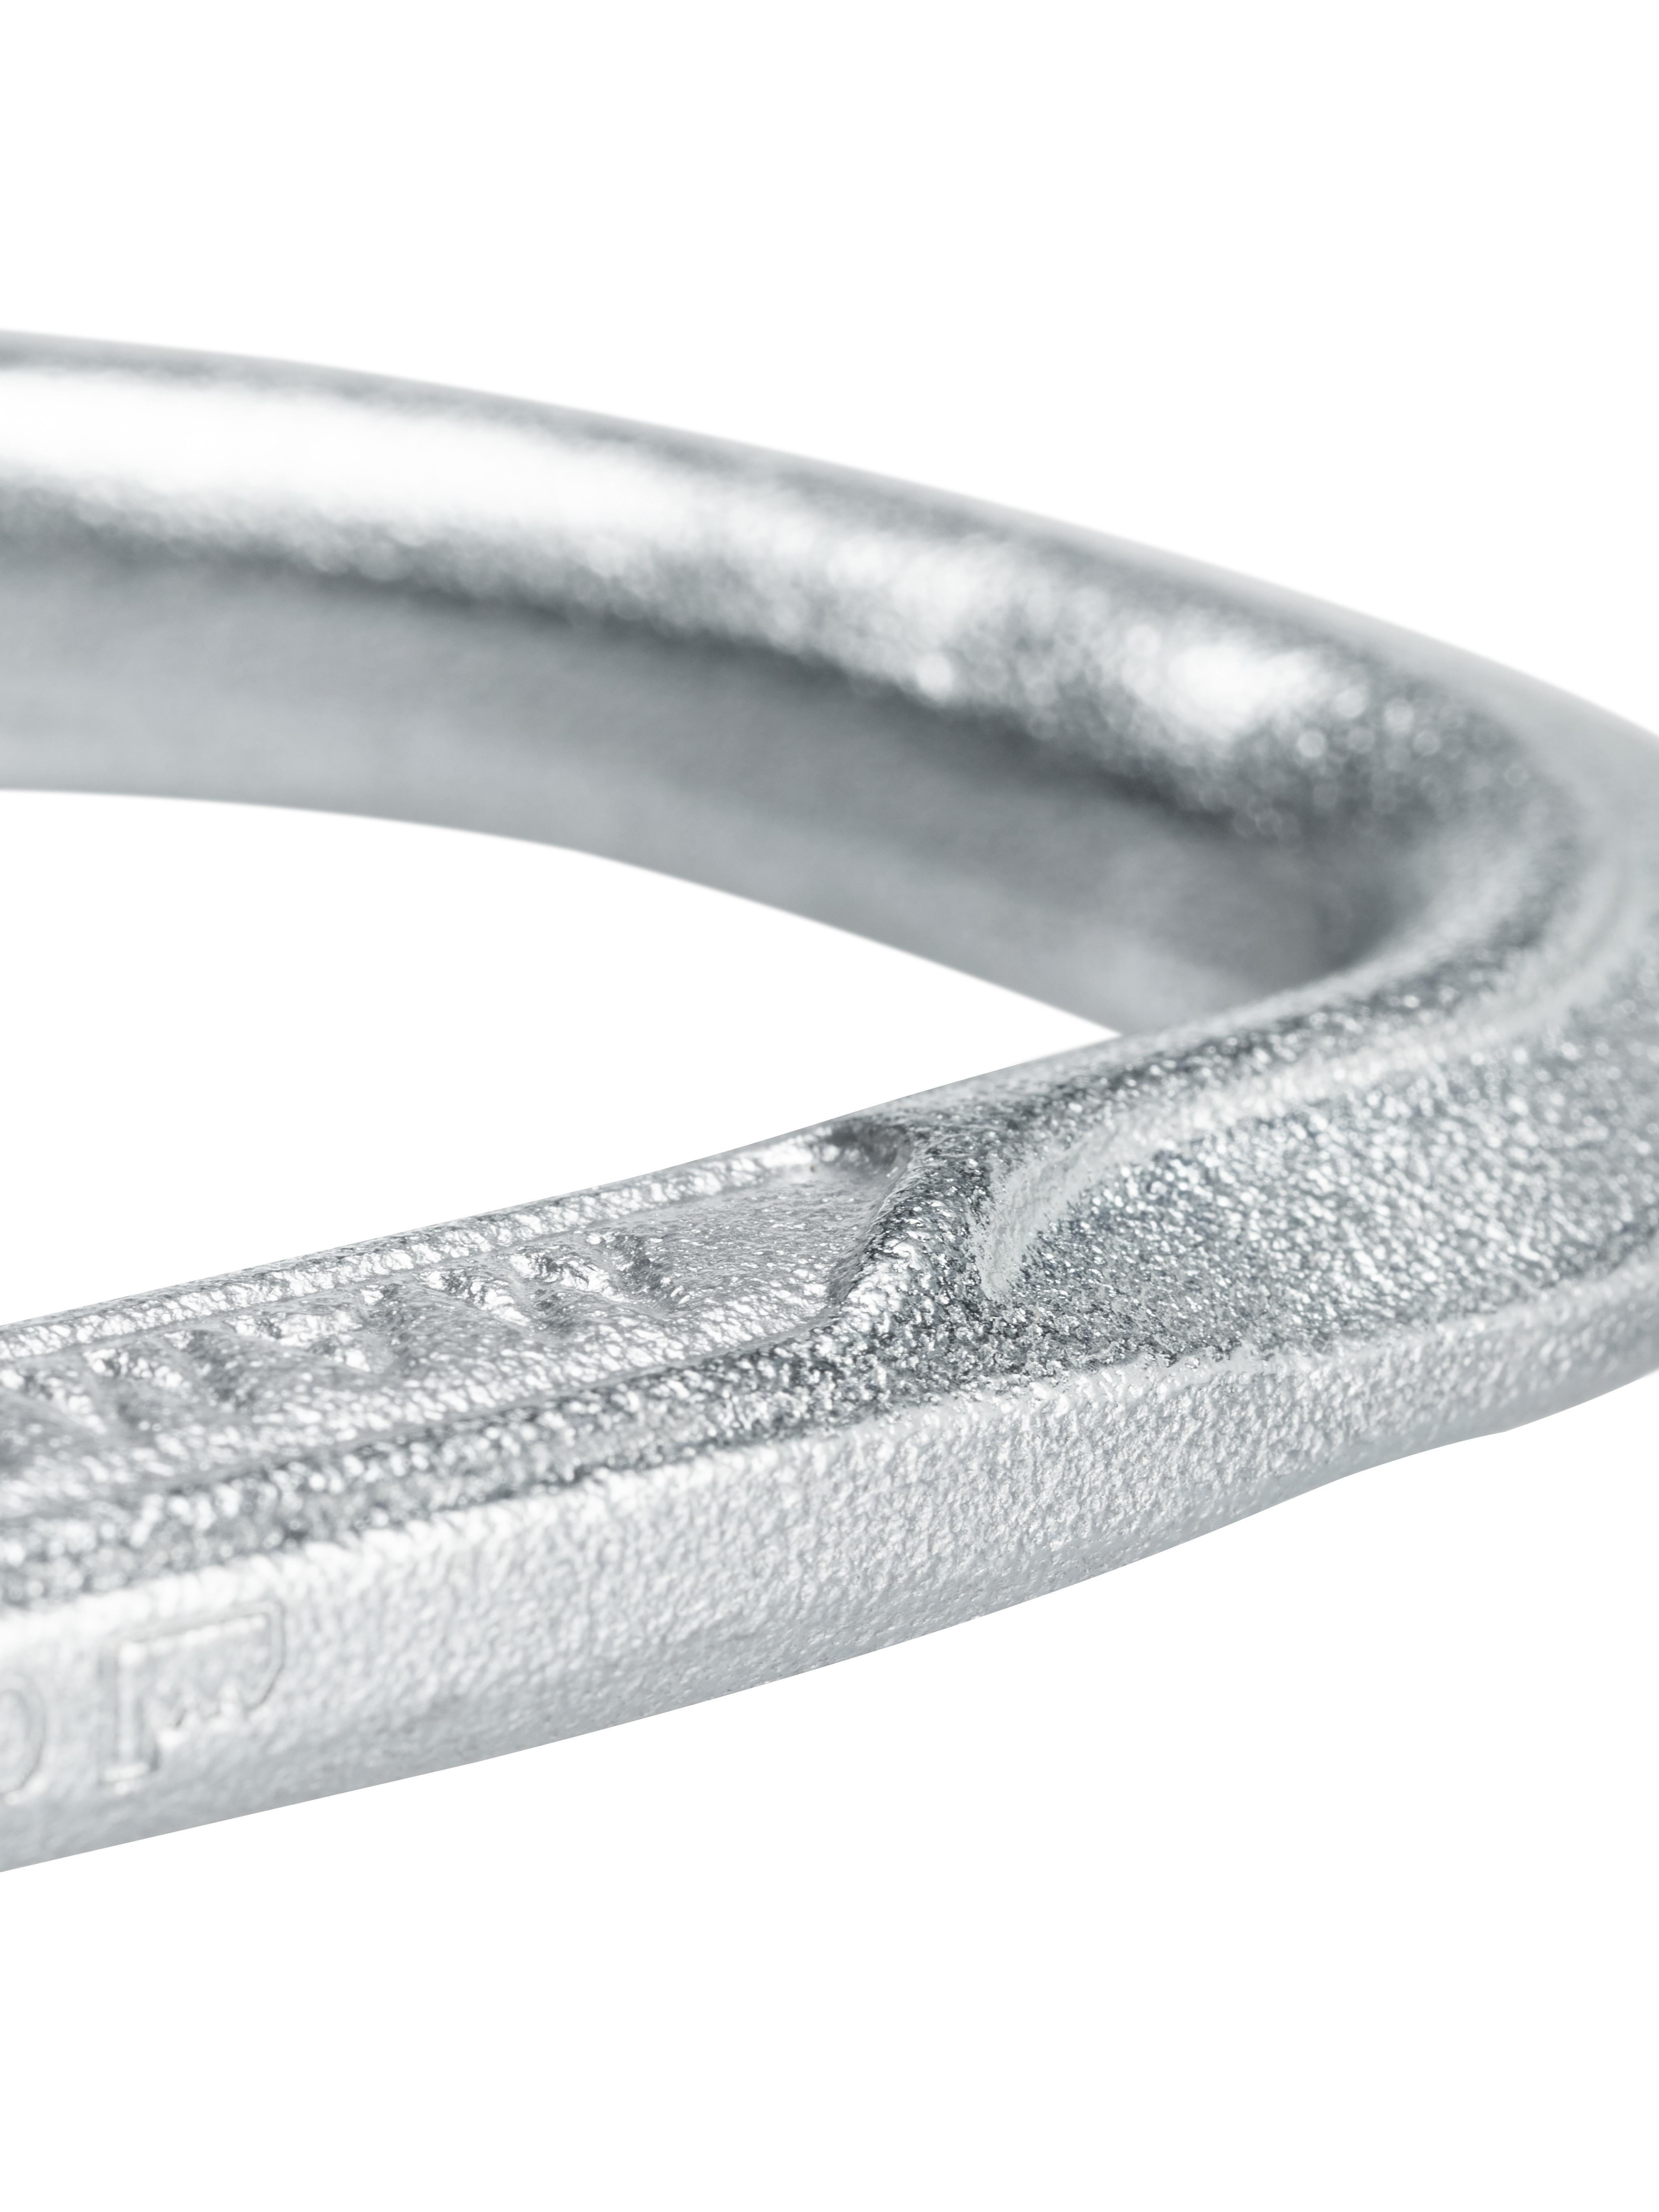 Element Steel Key Lock product image